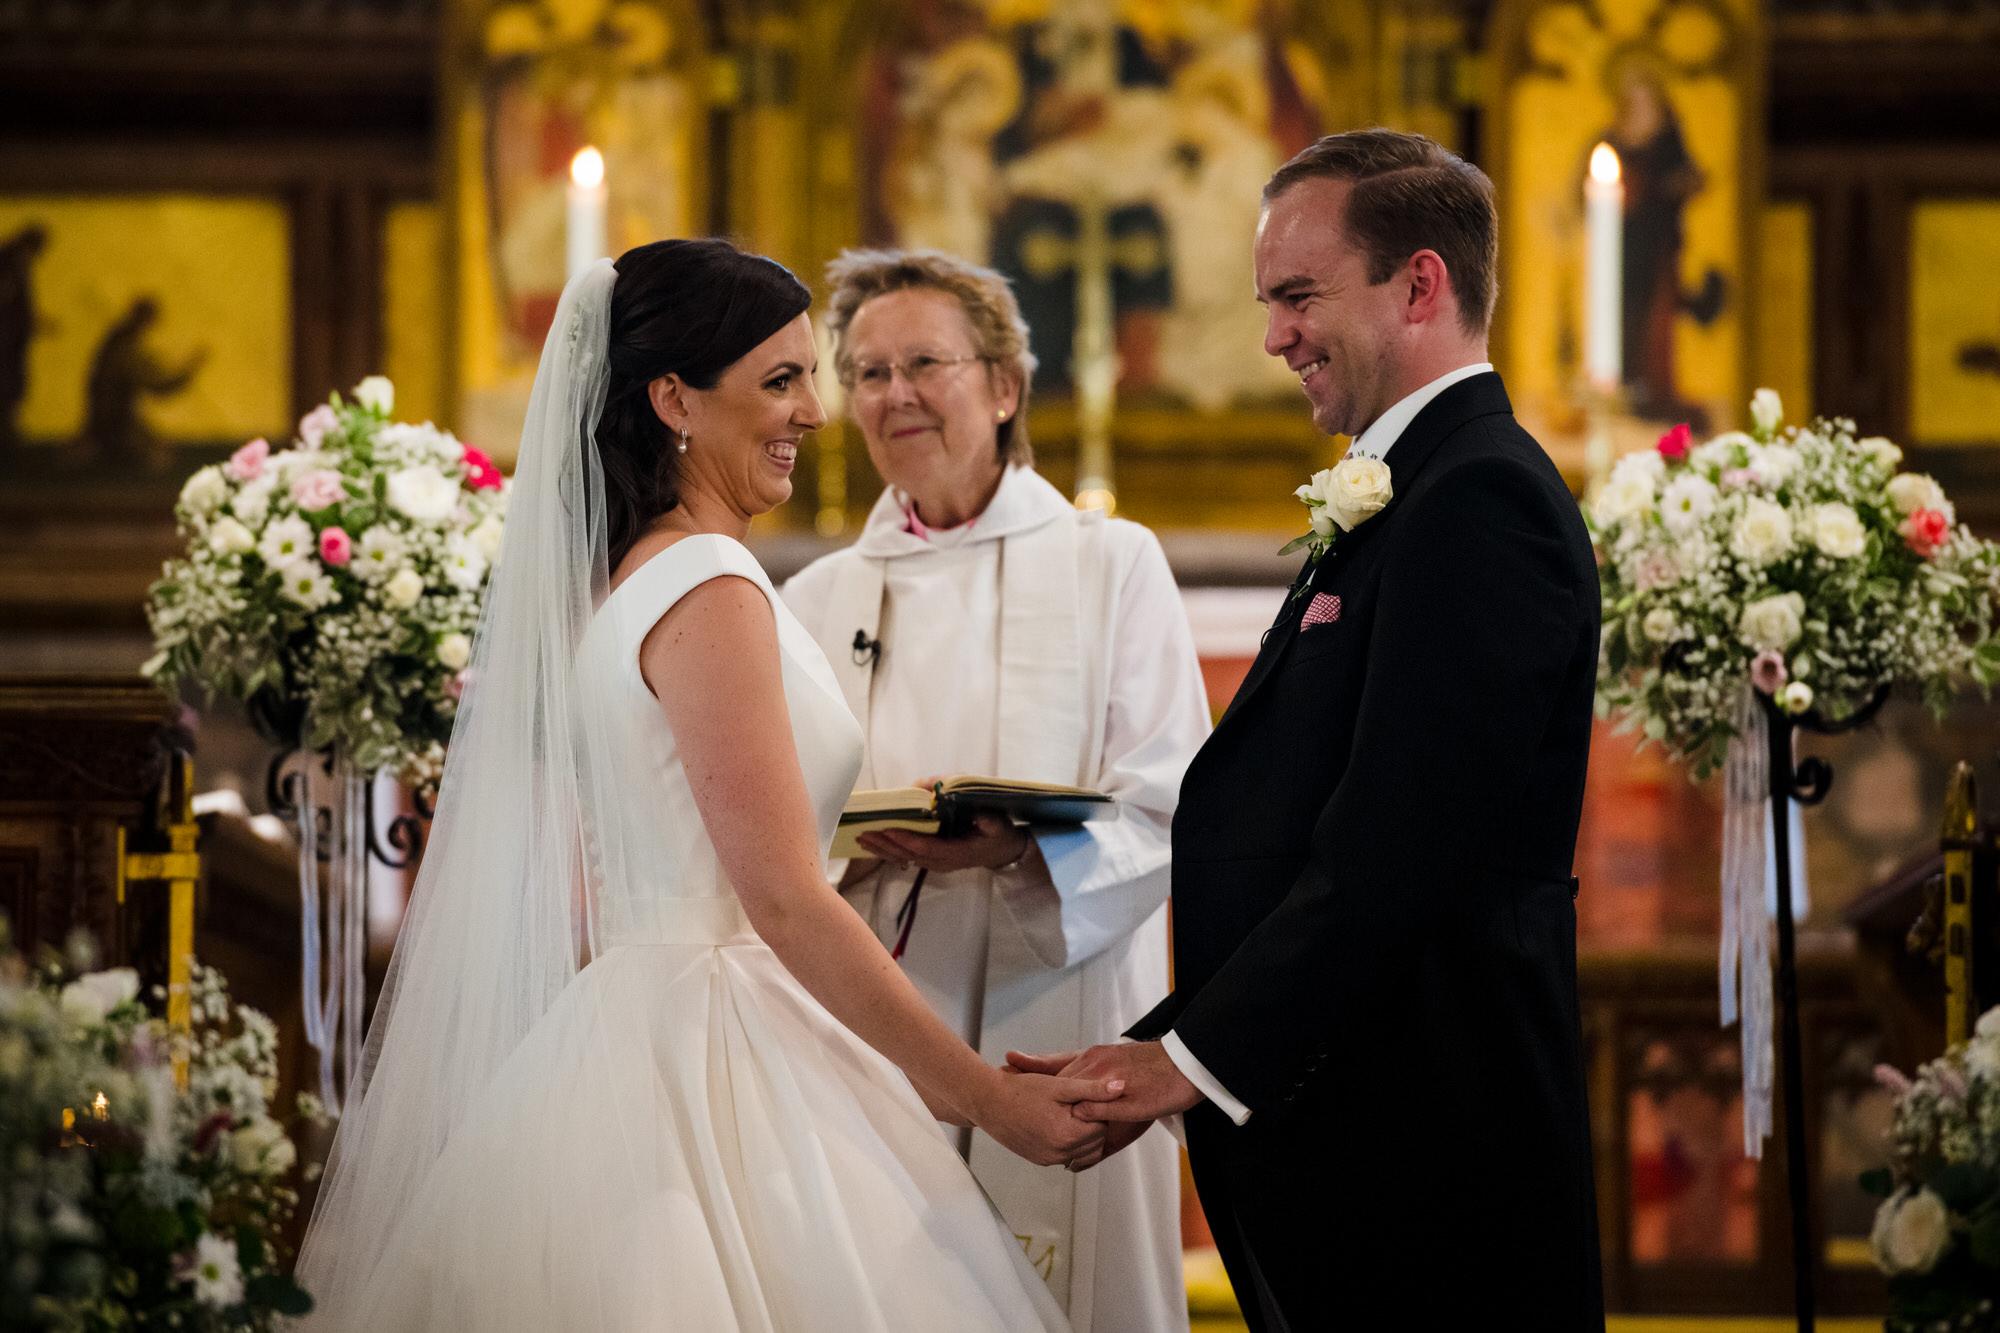 Shilstone wedding photographer 13